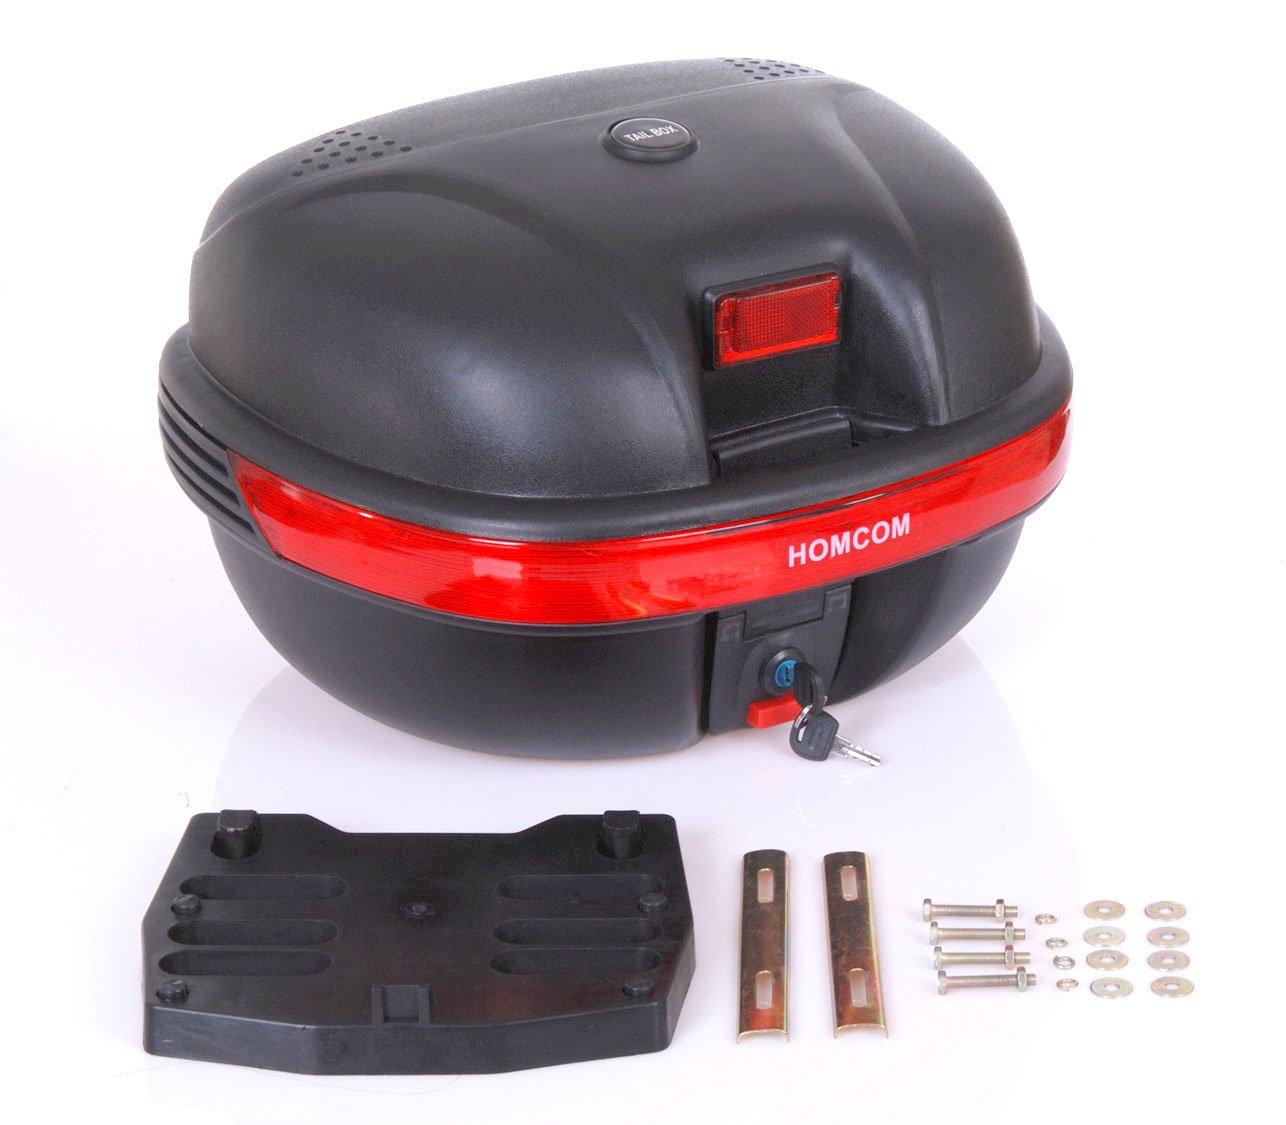 HOMCOM Detachable Scooter Motorcycle Trunk Top Case Lock Storage Luggage T- Box Black (35L) Aosom Canada CA5094-00080231